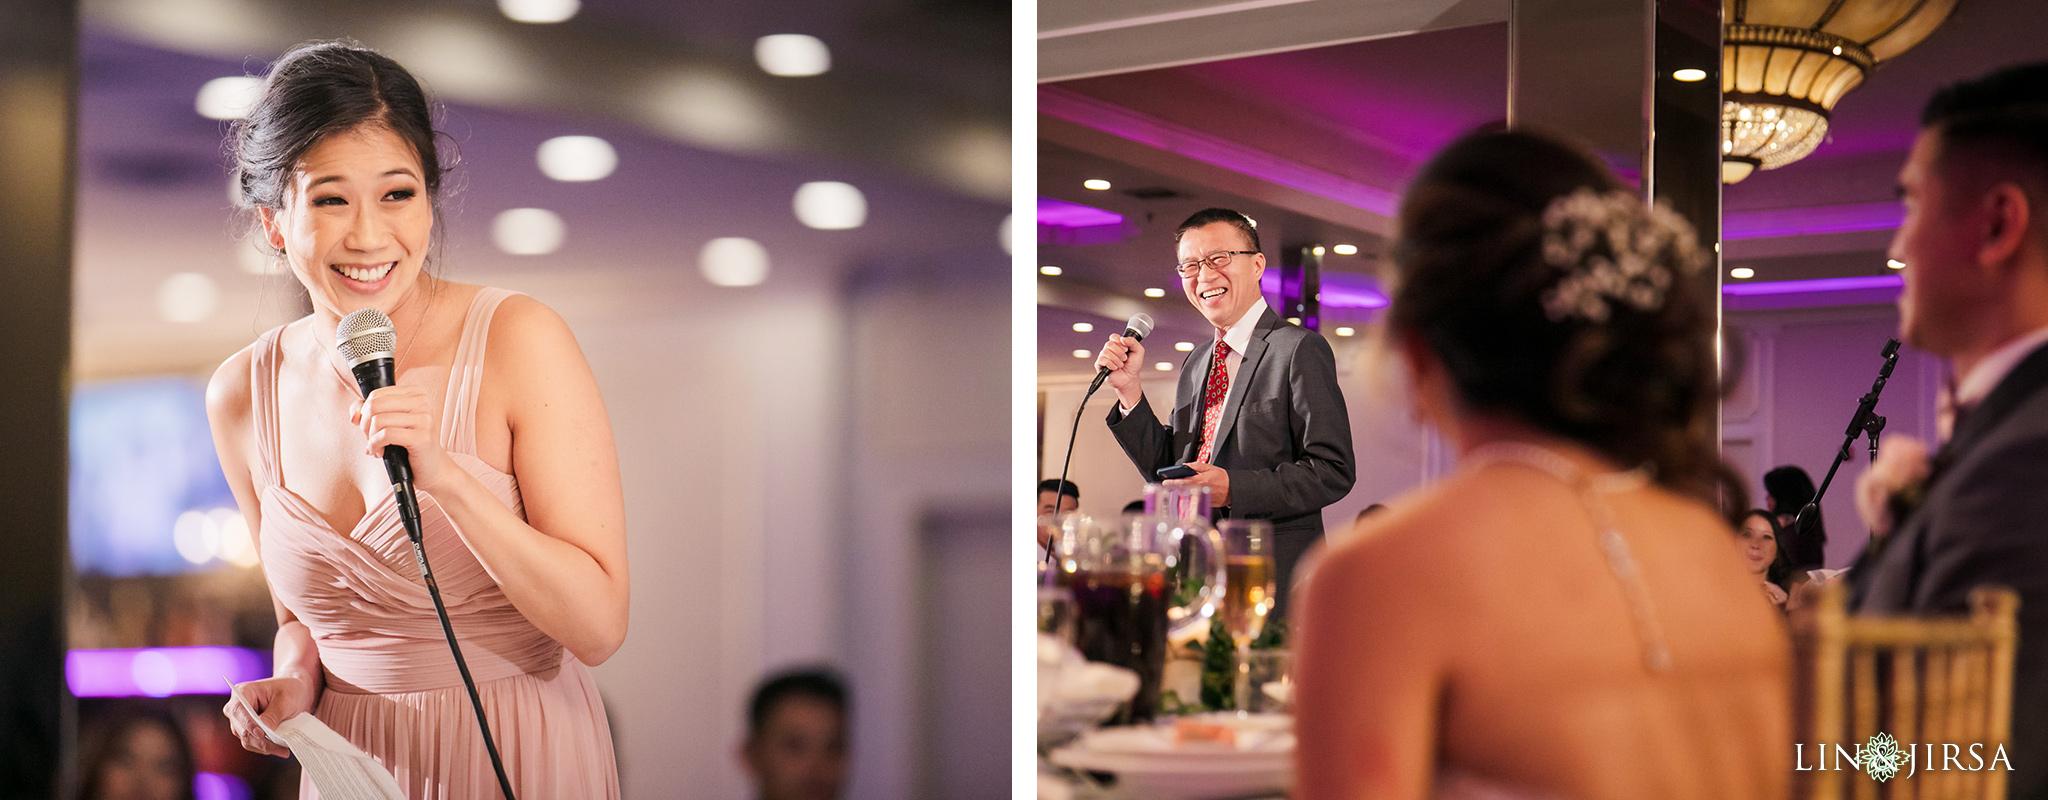 36 grandview ballroom glendale wedding photography